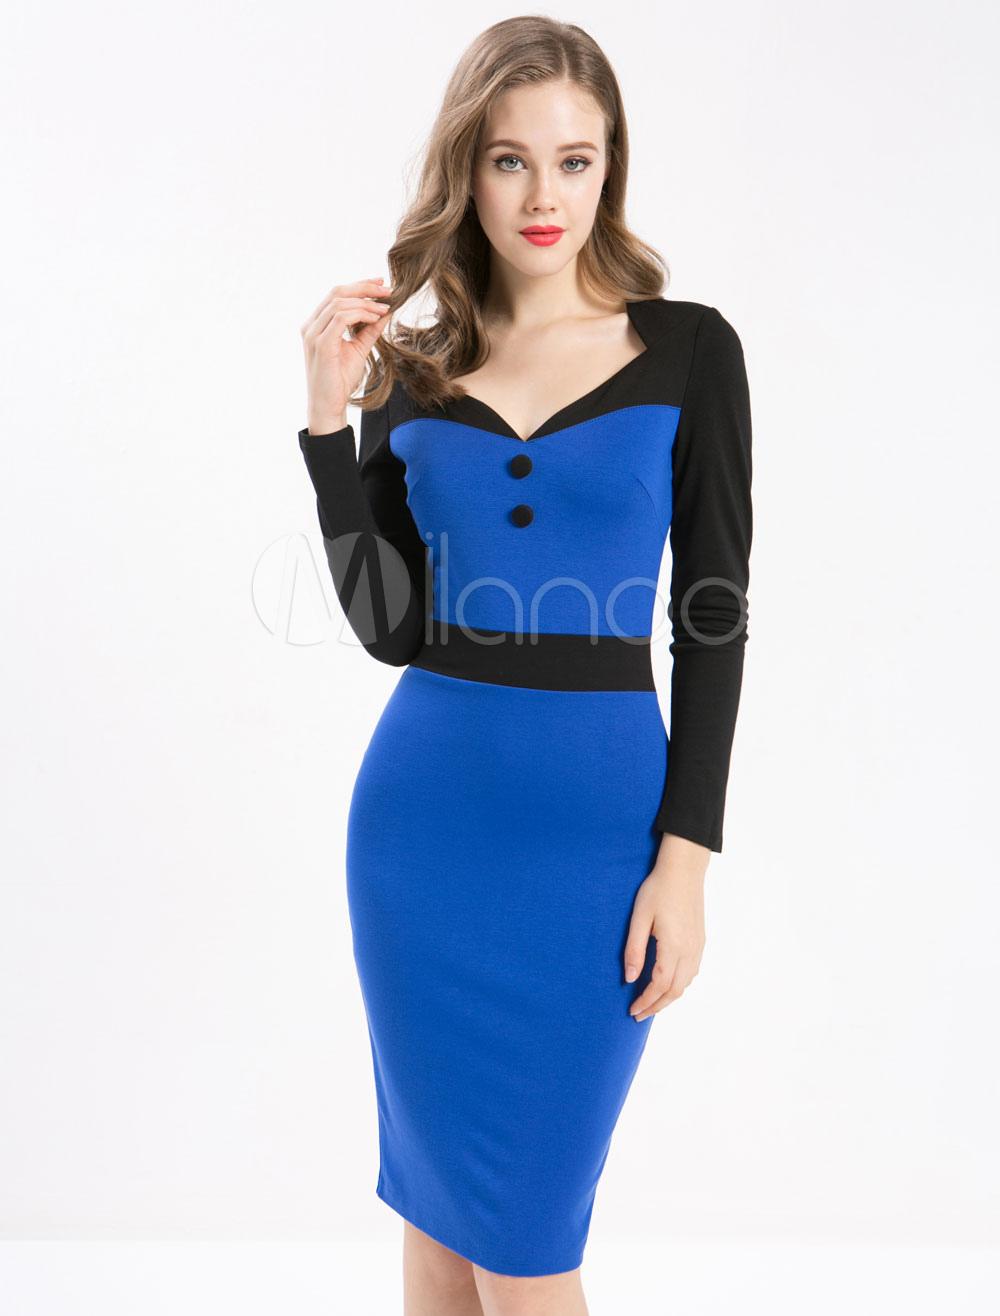 Vintage Blue Dress Bodycon Long Sleeve Women's V Neck Sheath Dress (Women\\'s Clothing Vintage Dresses) photo